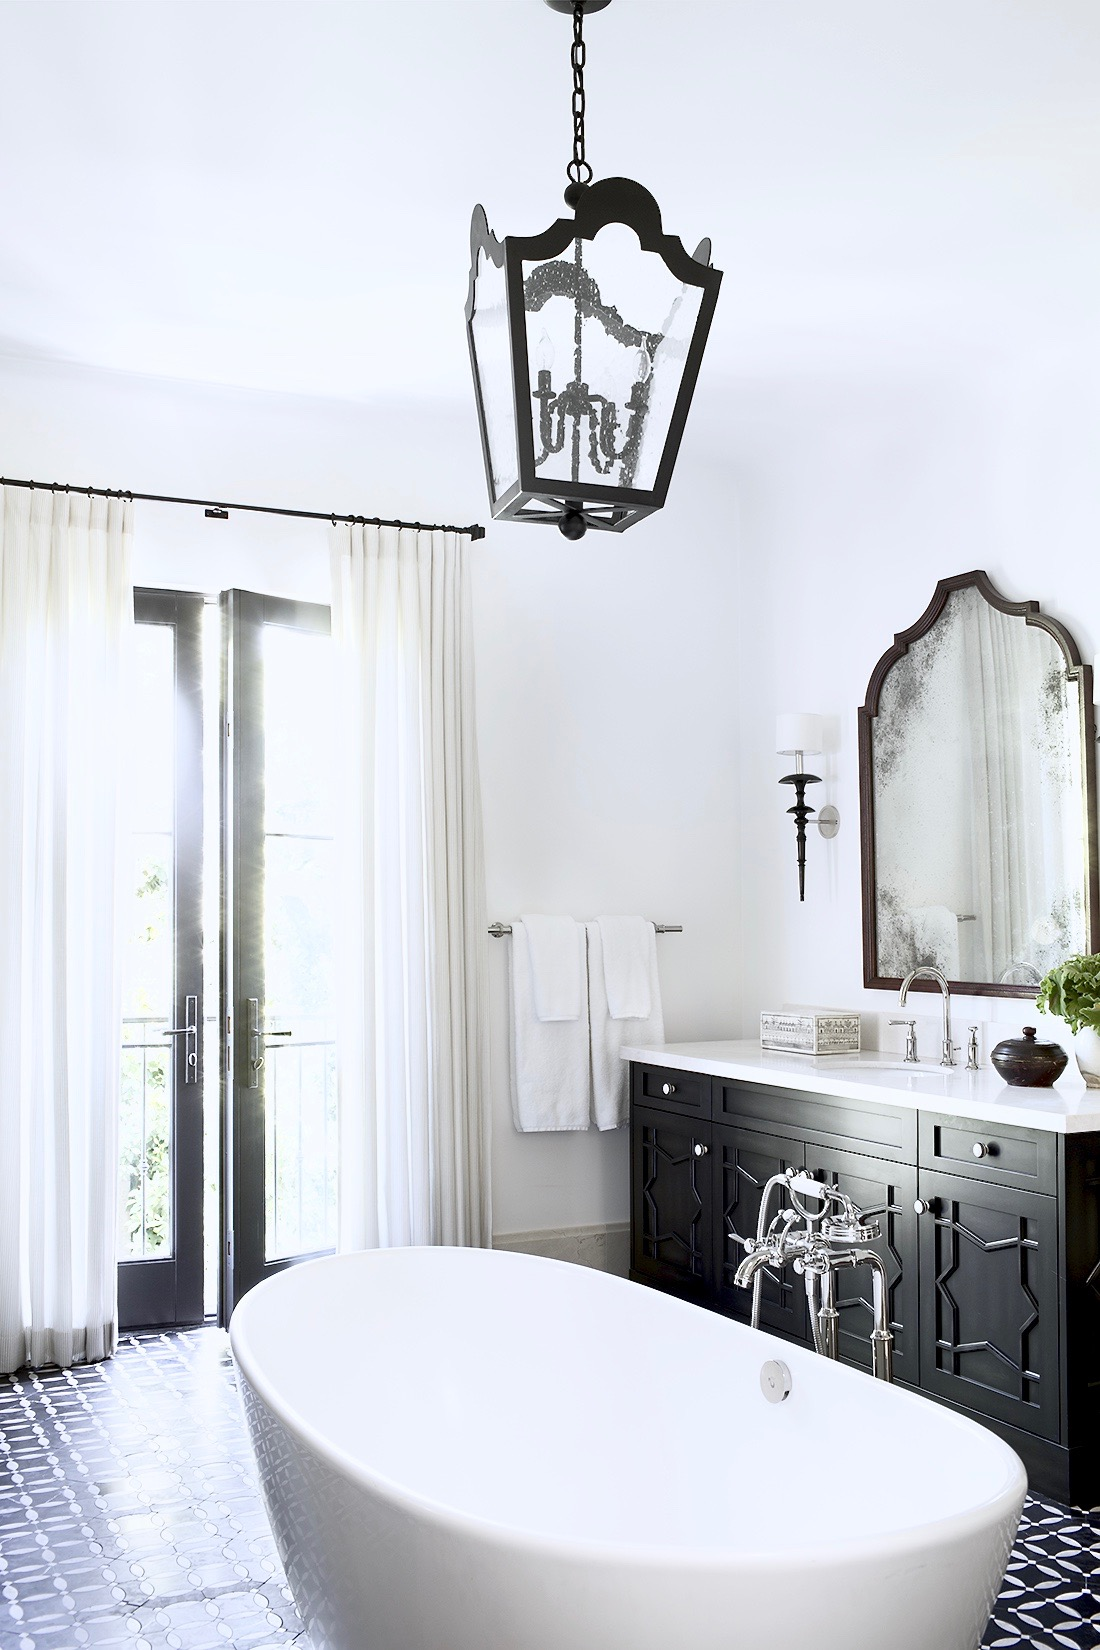 Bathroom Design Trend: Moroccan Modern — How Moroccan ...